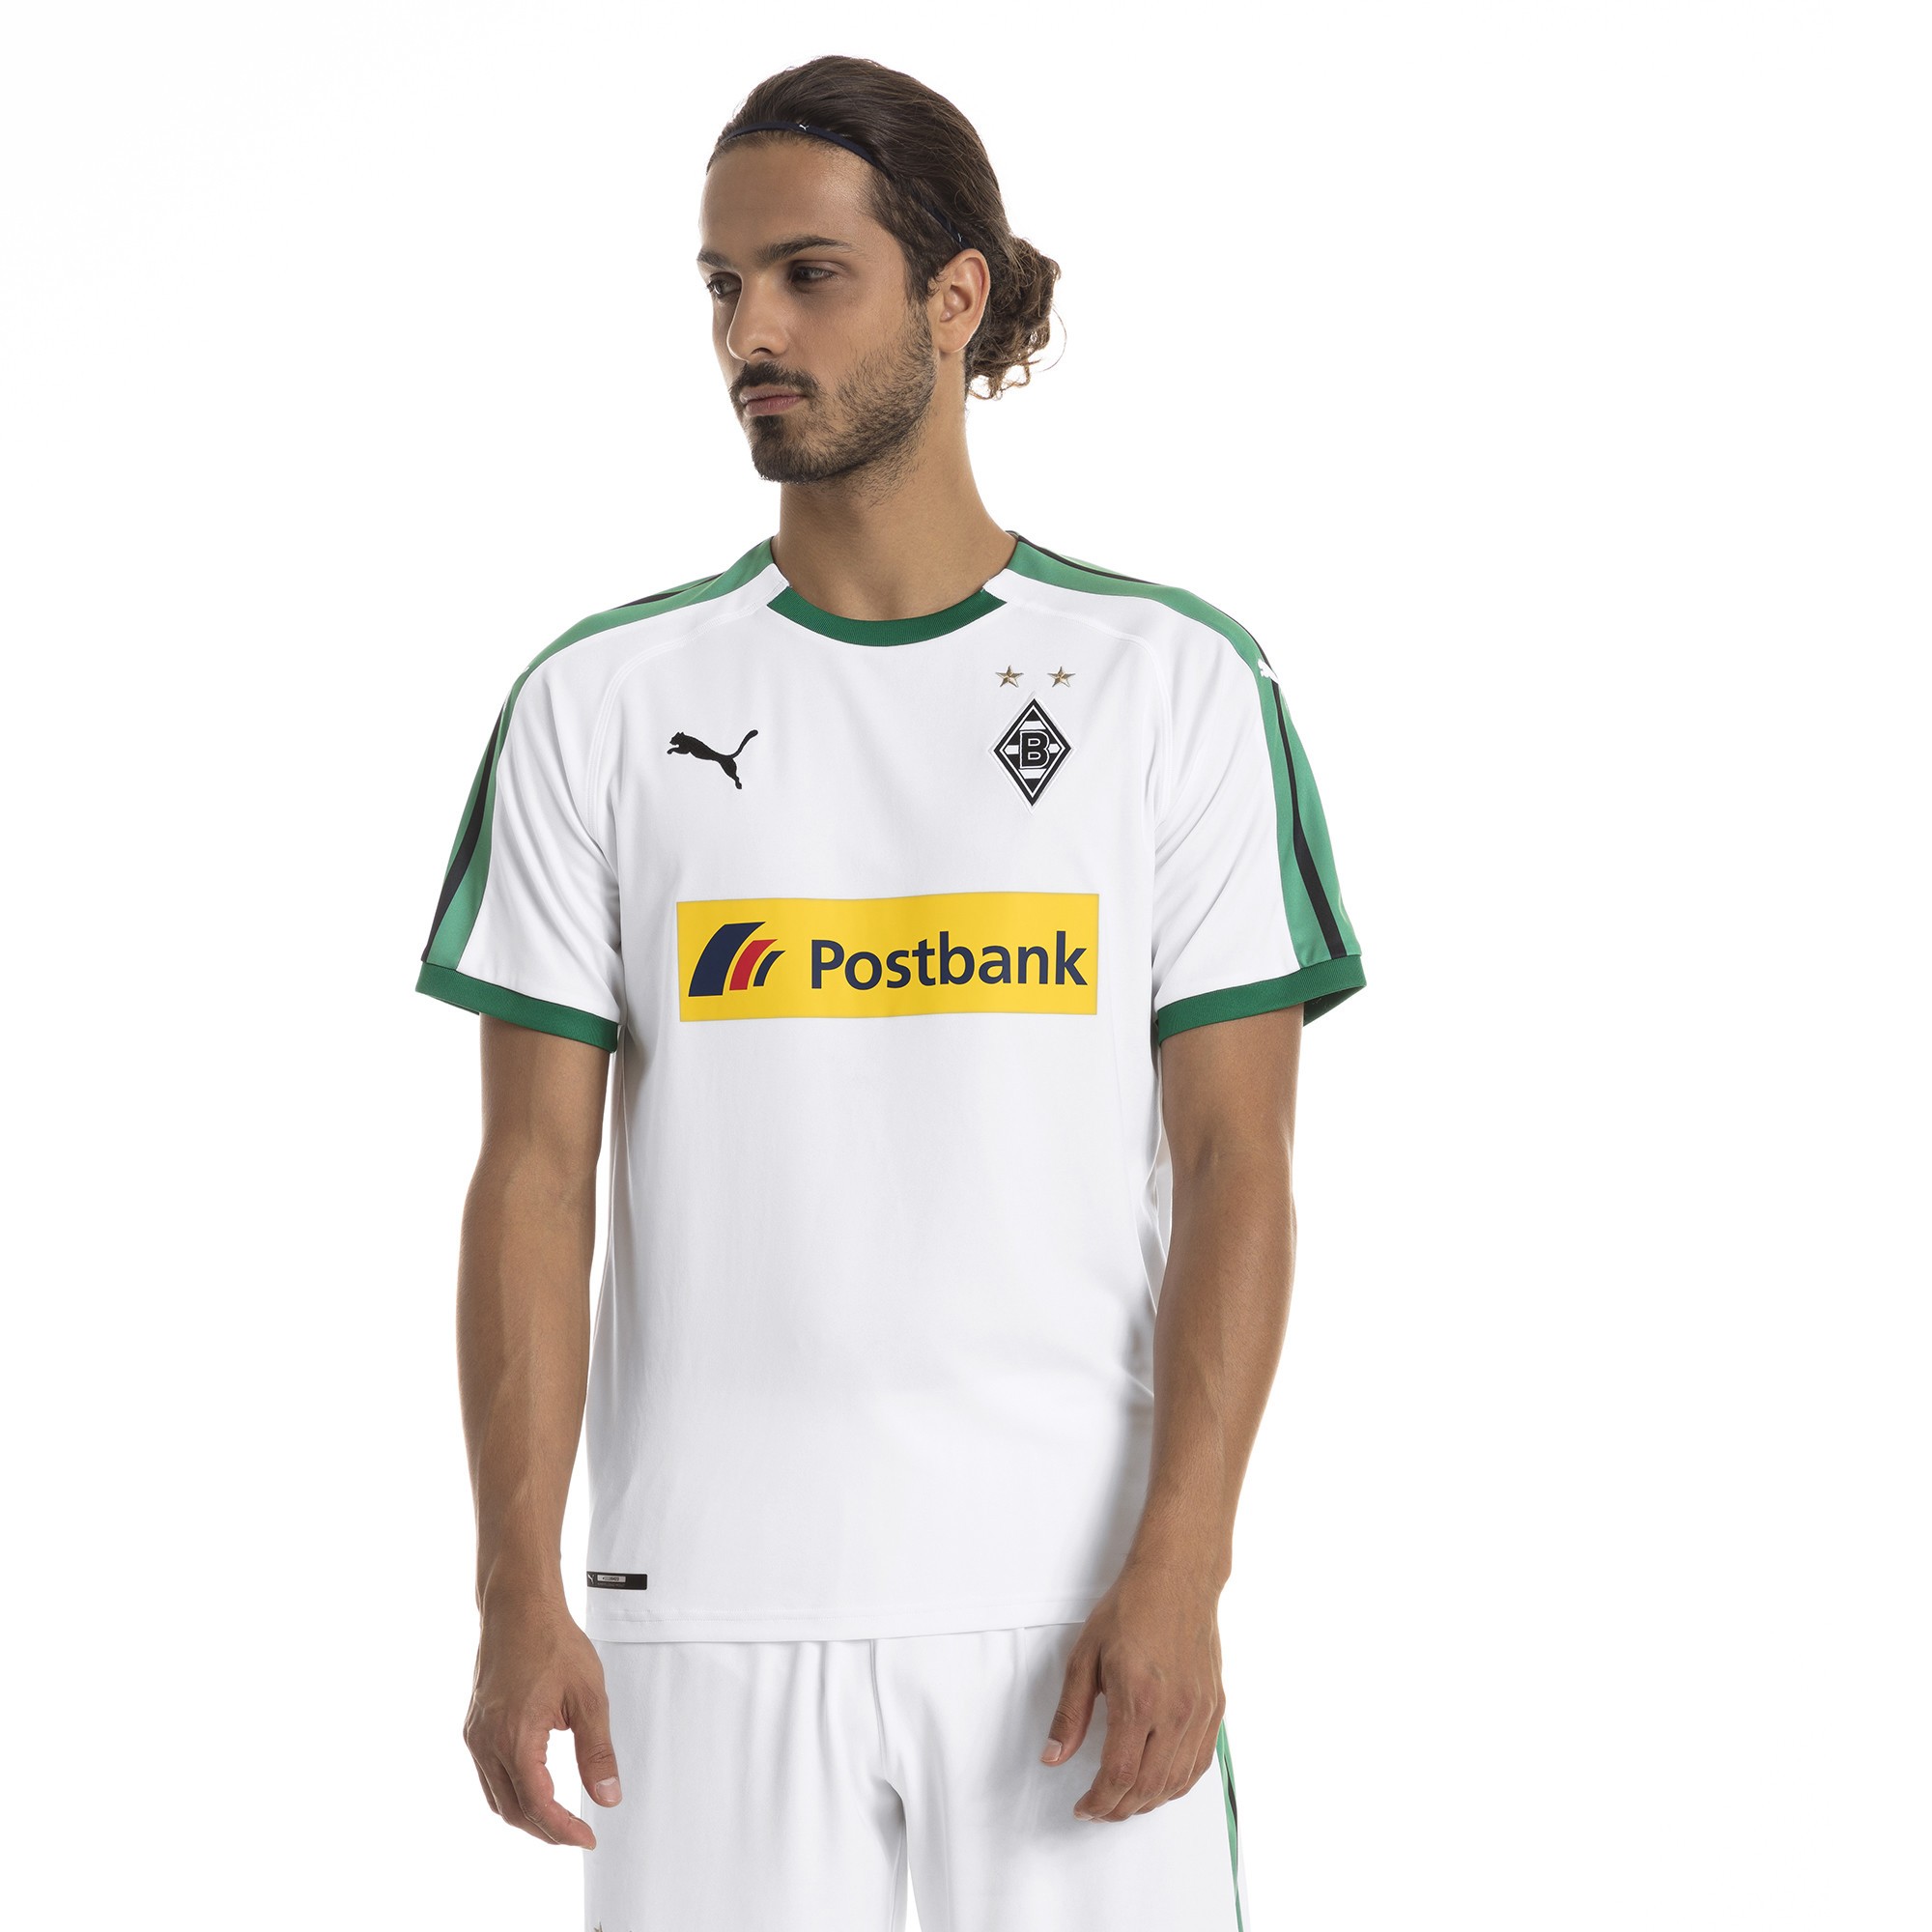 Indexbild 4 - PUMA Borussia Mönchengladbach Herren Replica Heimtrikot Männer Fußballtrikot Neu